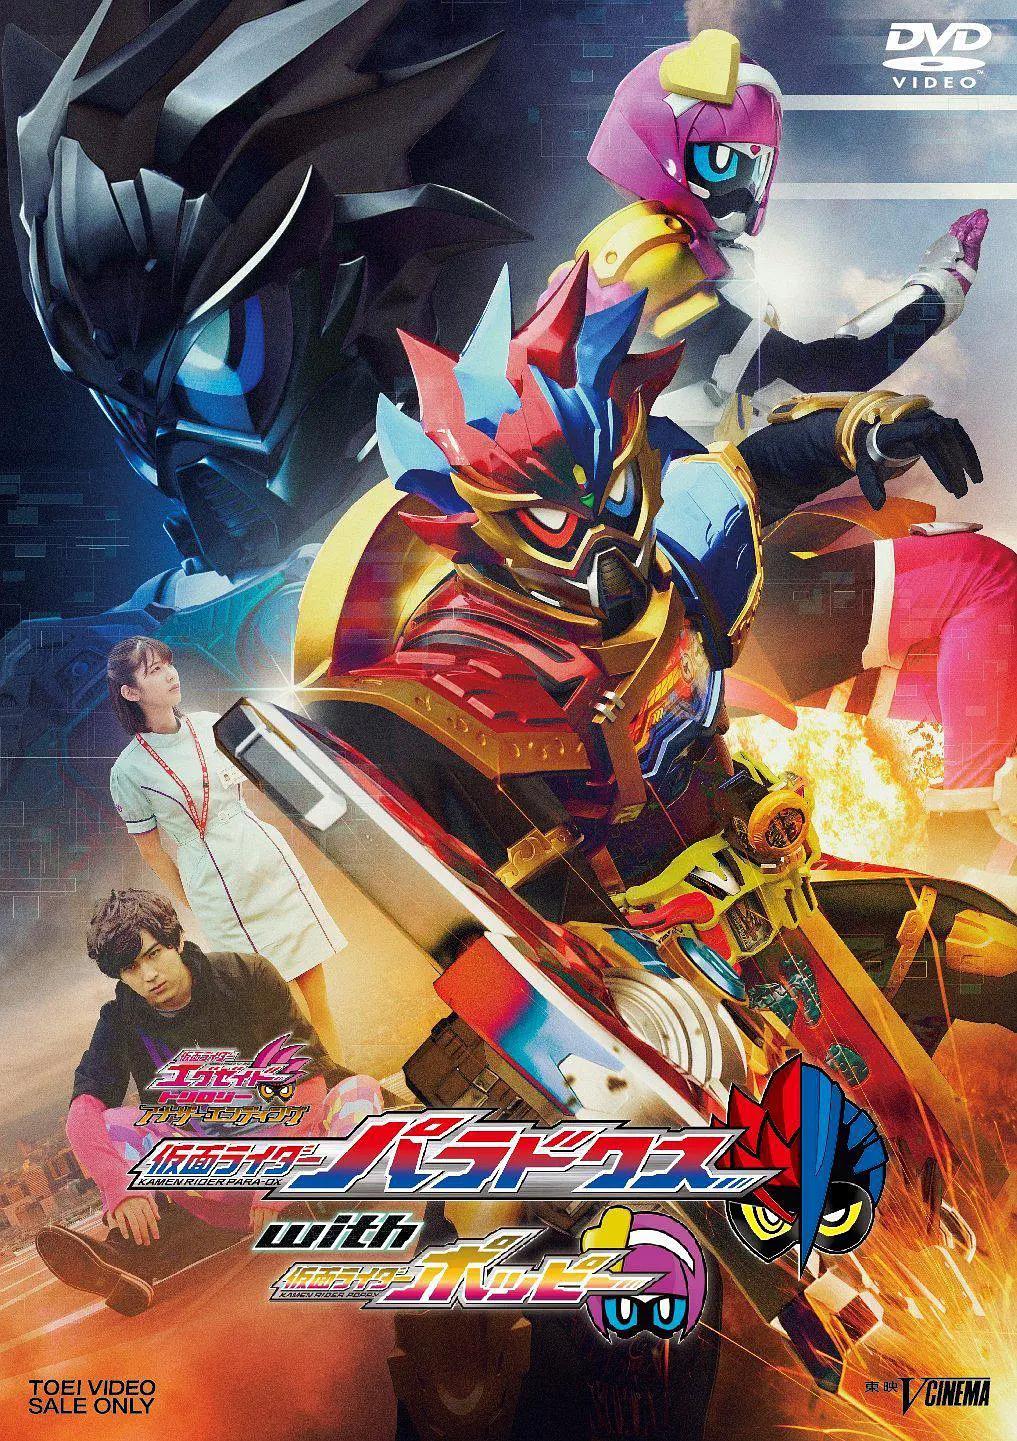 假面骑士EX-AID Trilogy Another Ending Part II